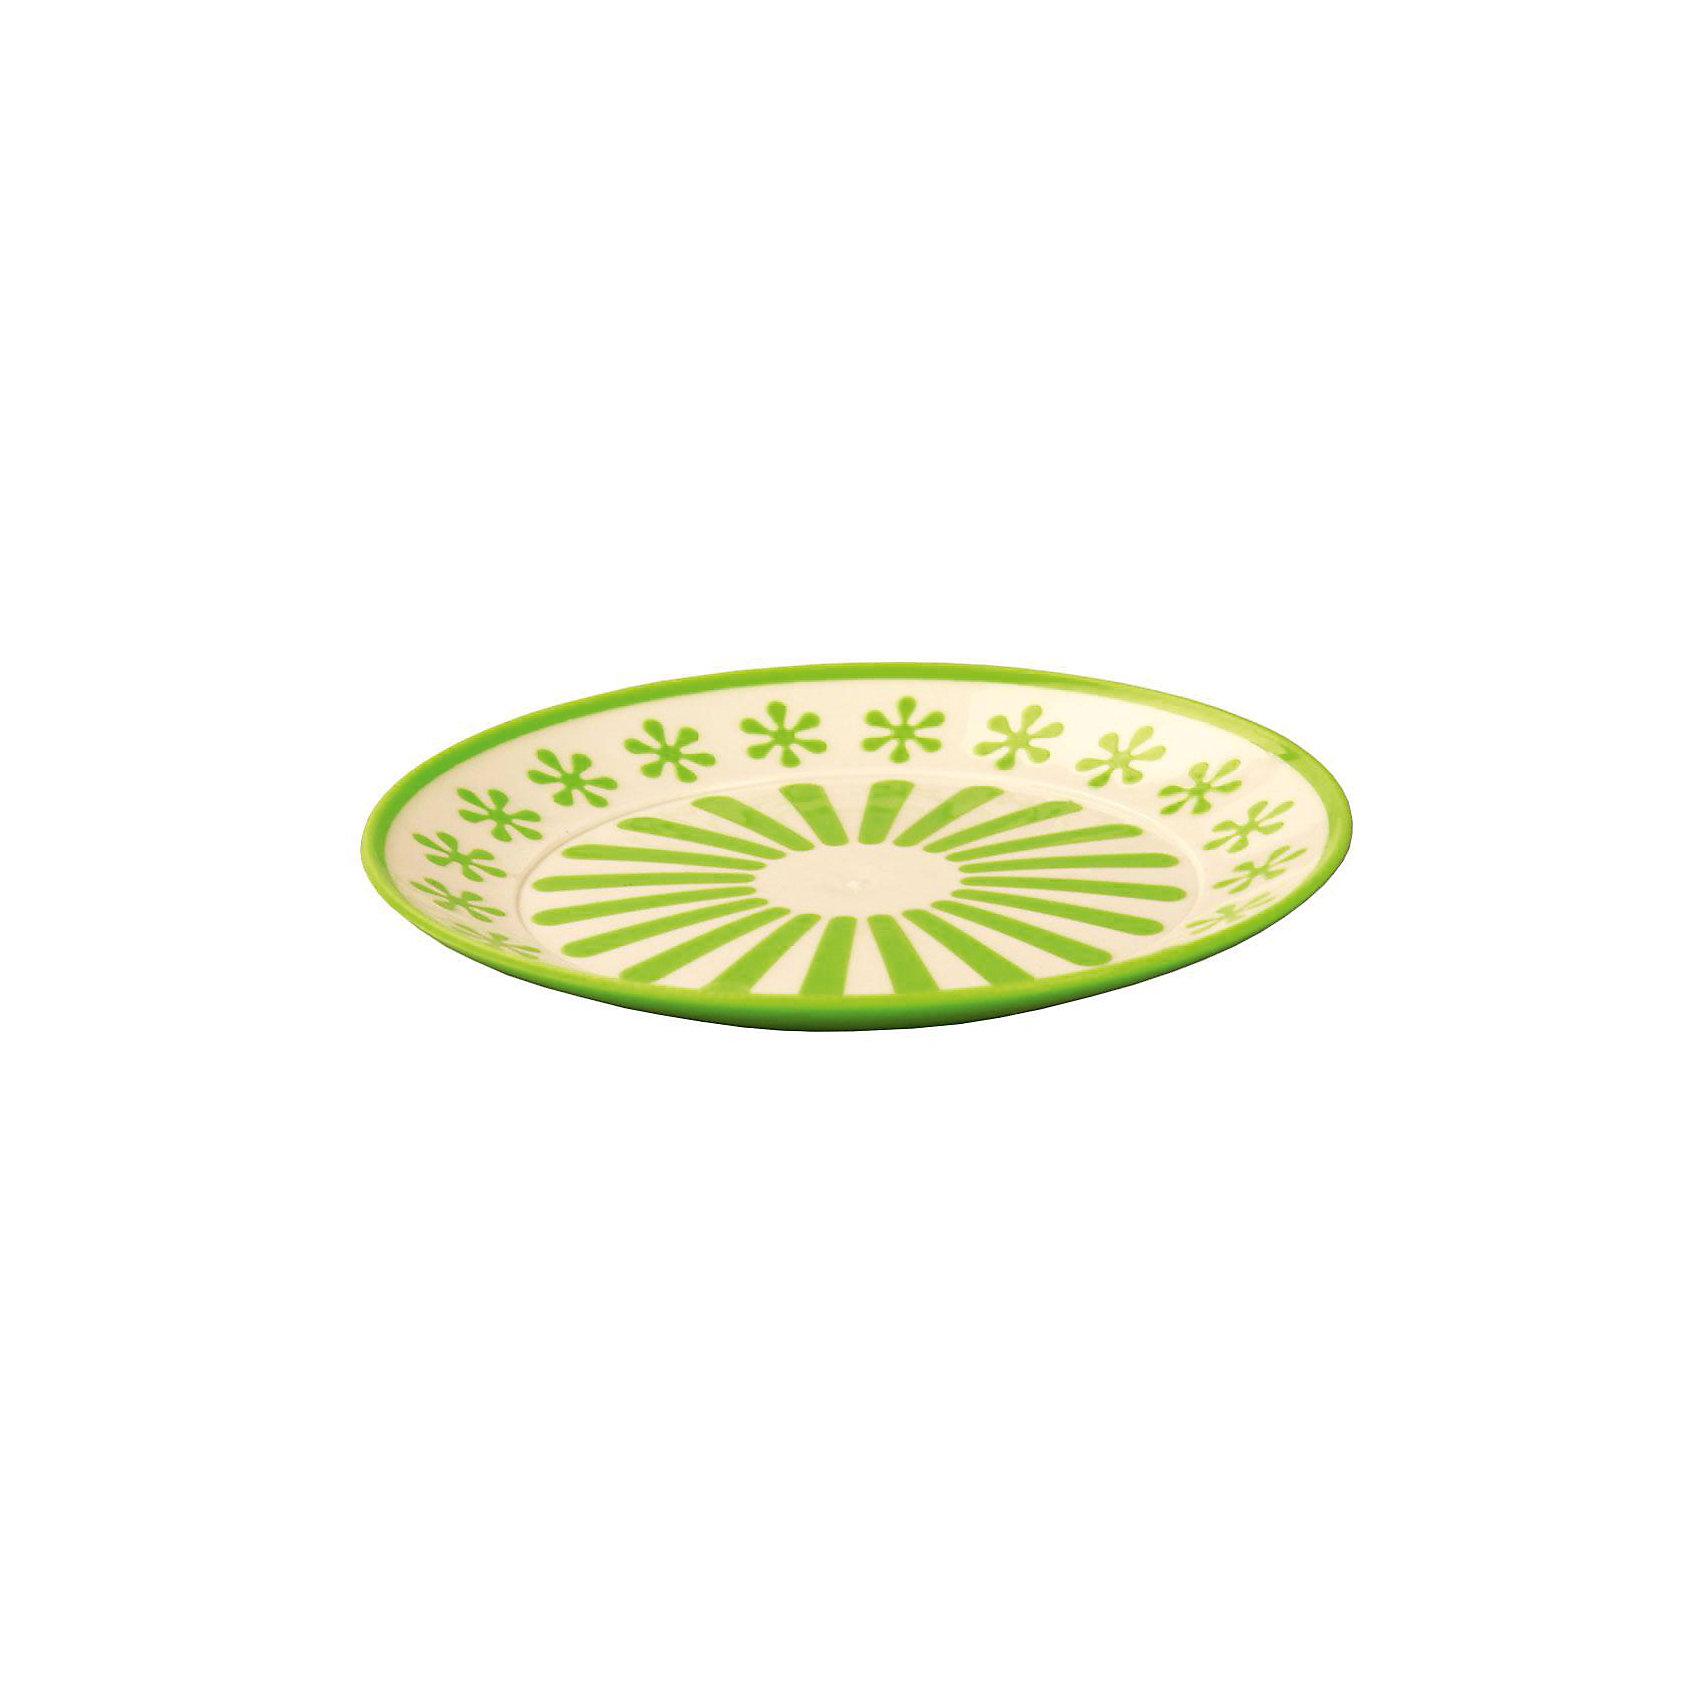 Alternativa Тарелка Валенсия, Alternativa, салатовый-белый alternativa горка для купания alternativa розовый